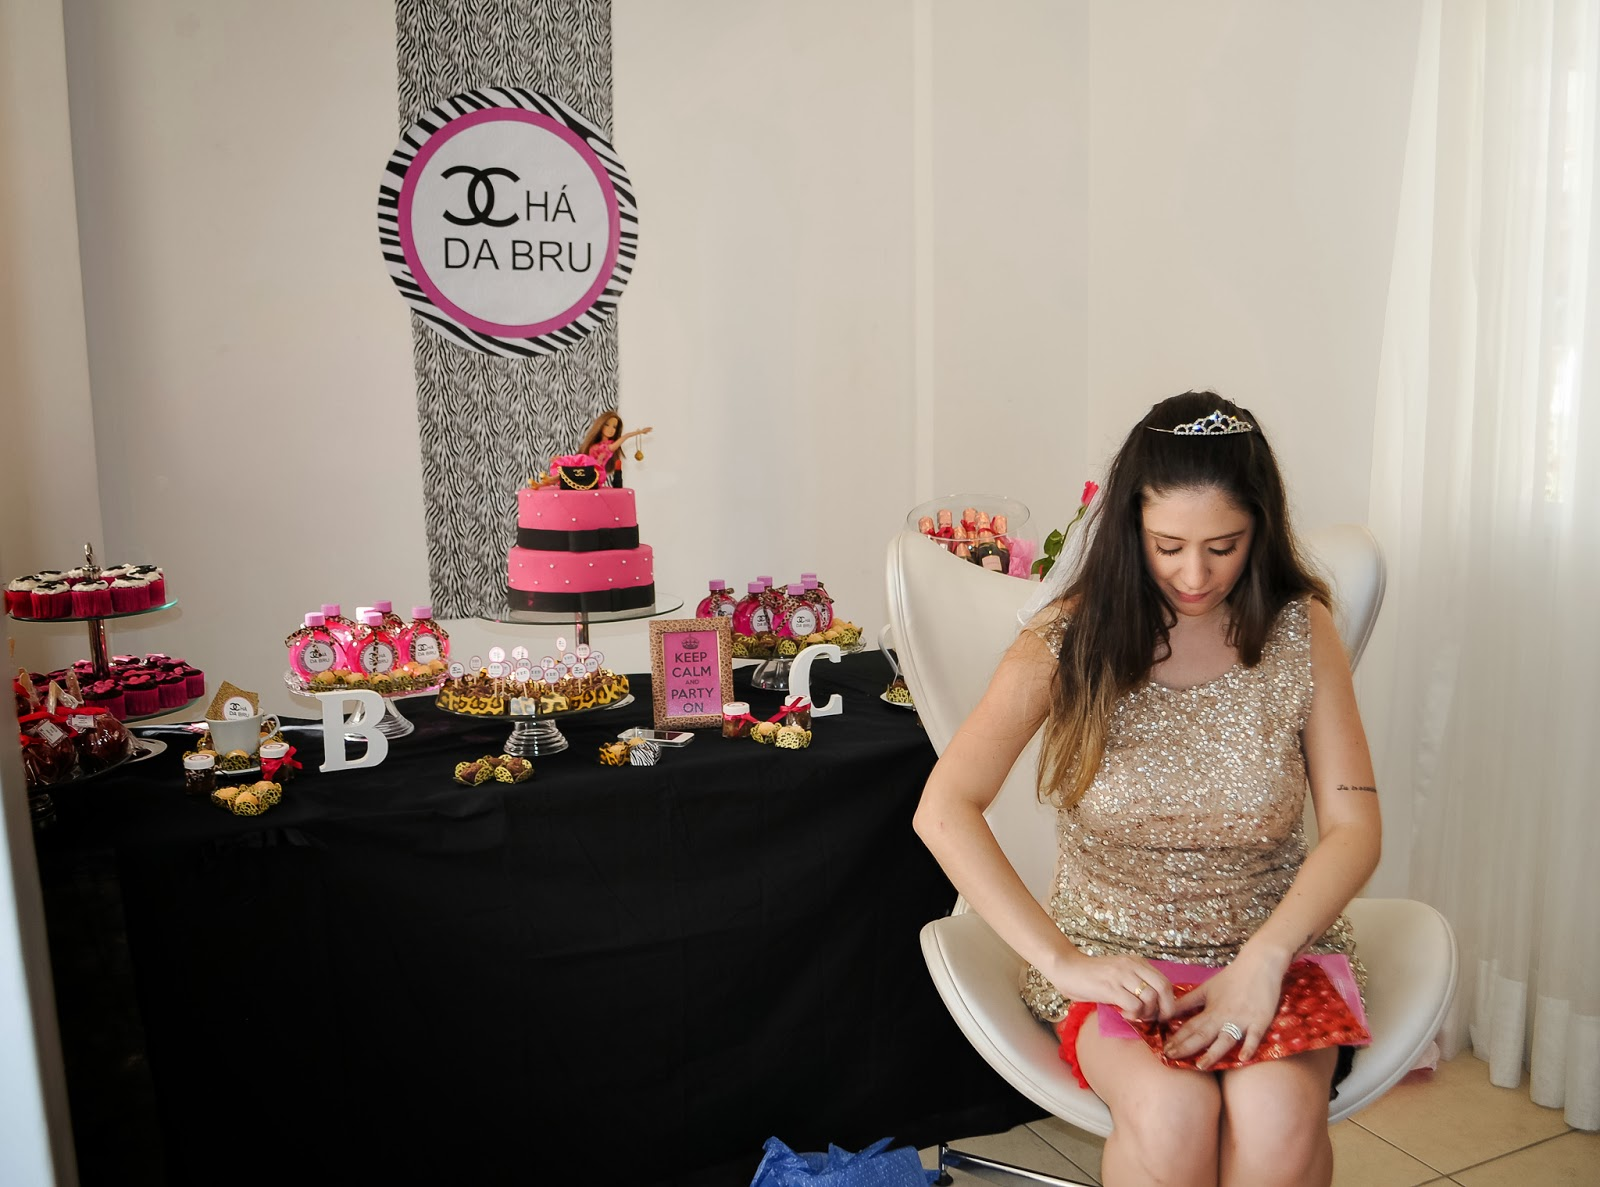 cha-lingerie-noiva-decoracao-mesa-bolo